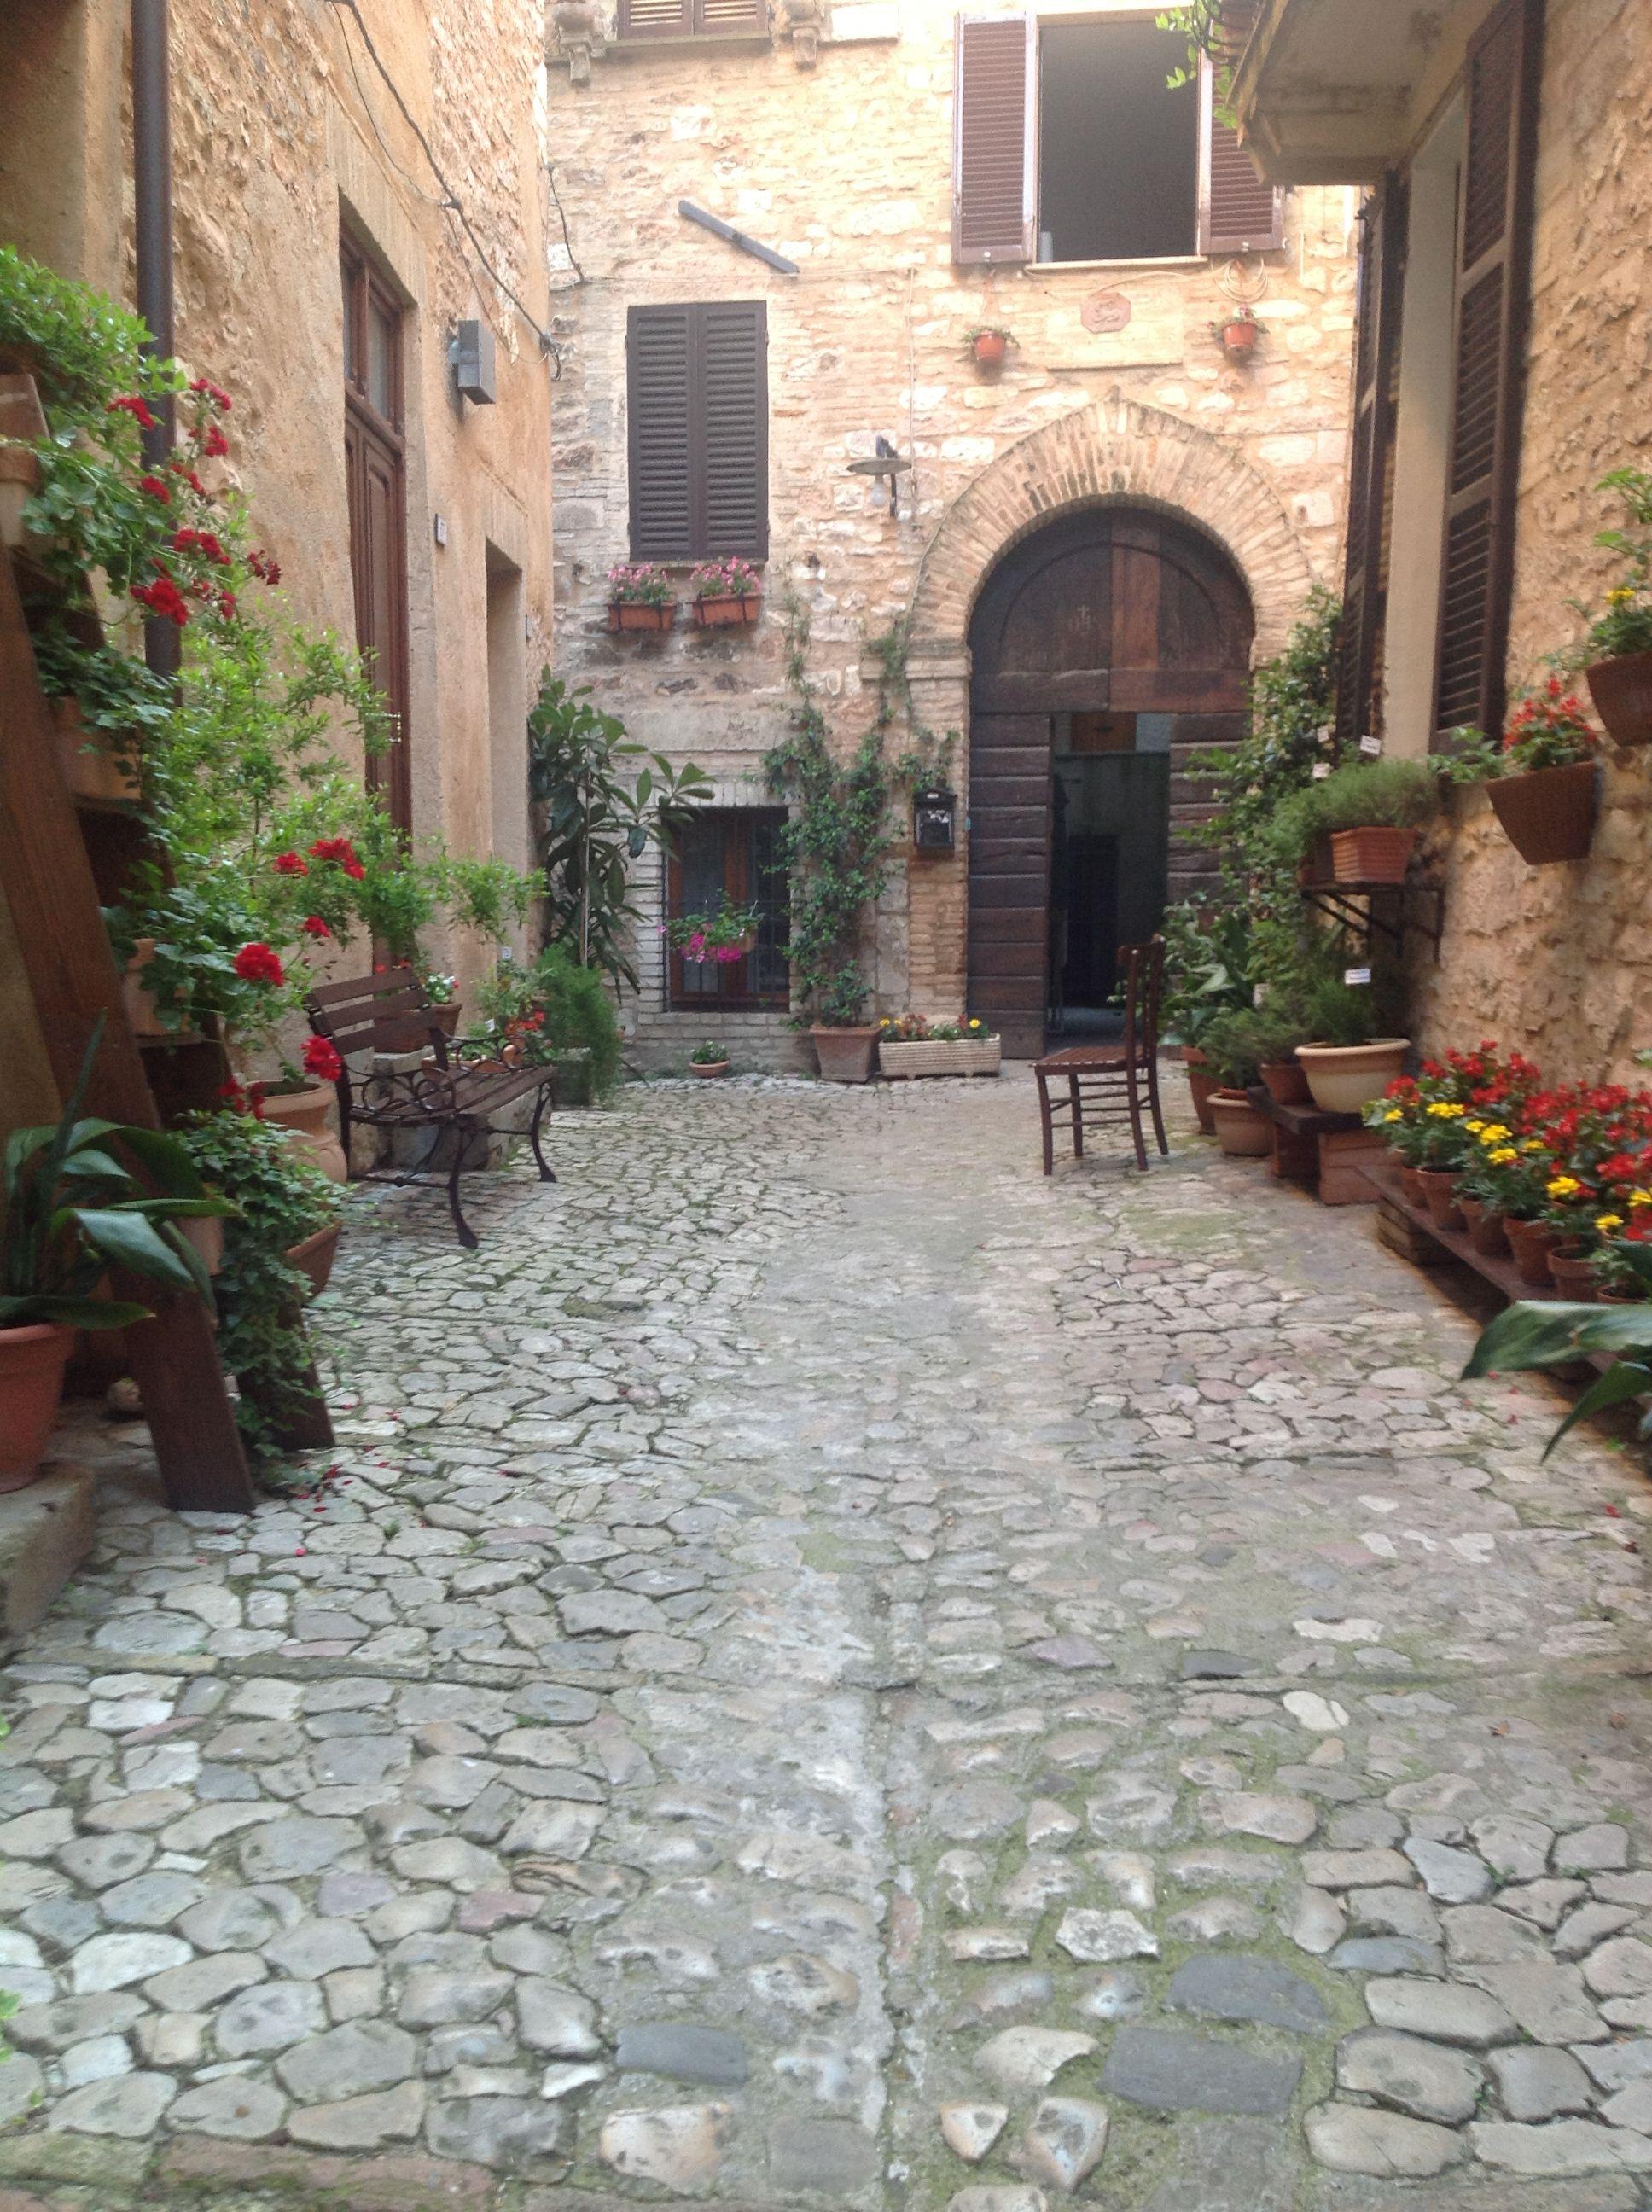 Garden Ideas 2013 tuscan garden 6/2013 half moon planters on wall | front door/porch